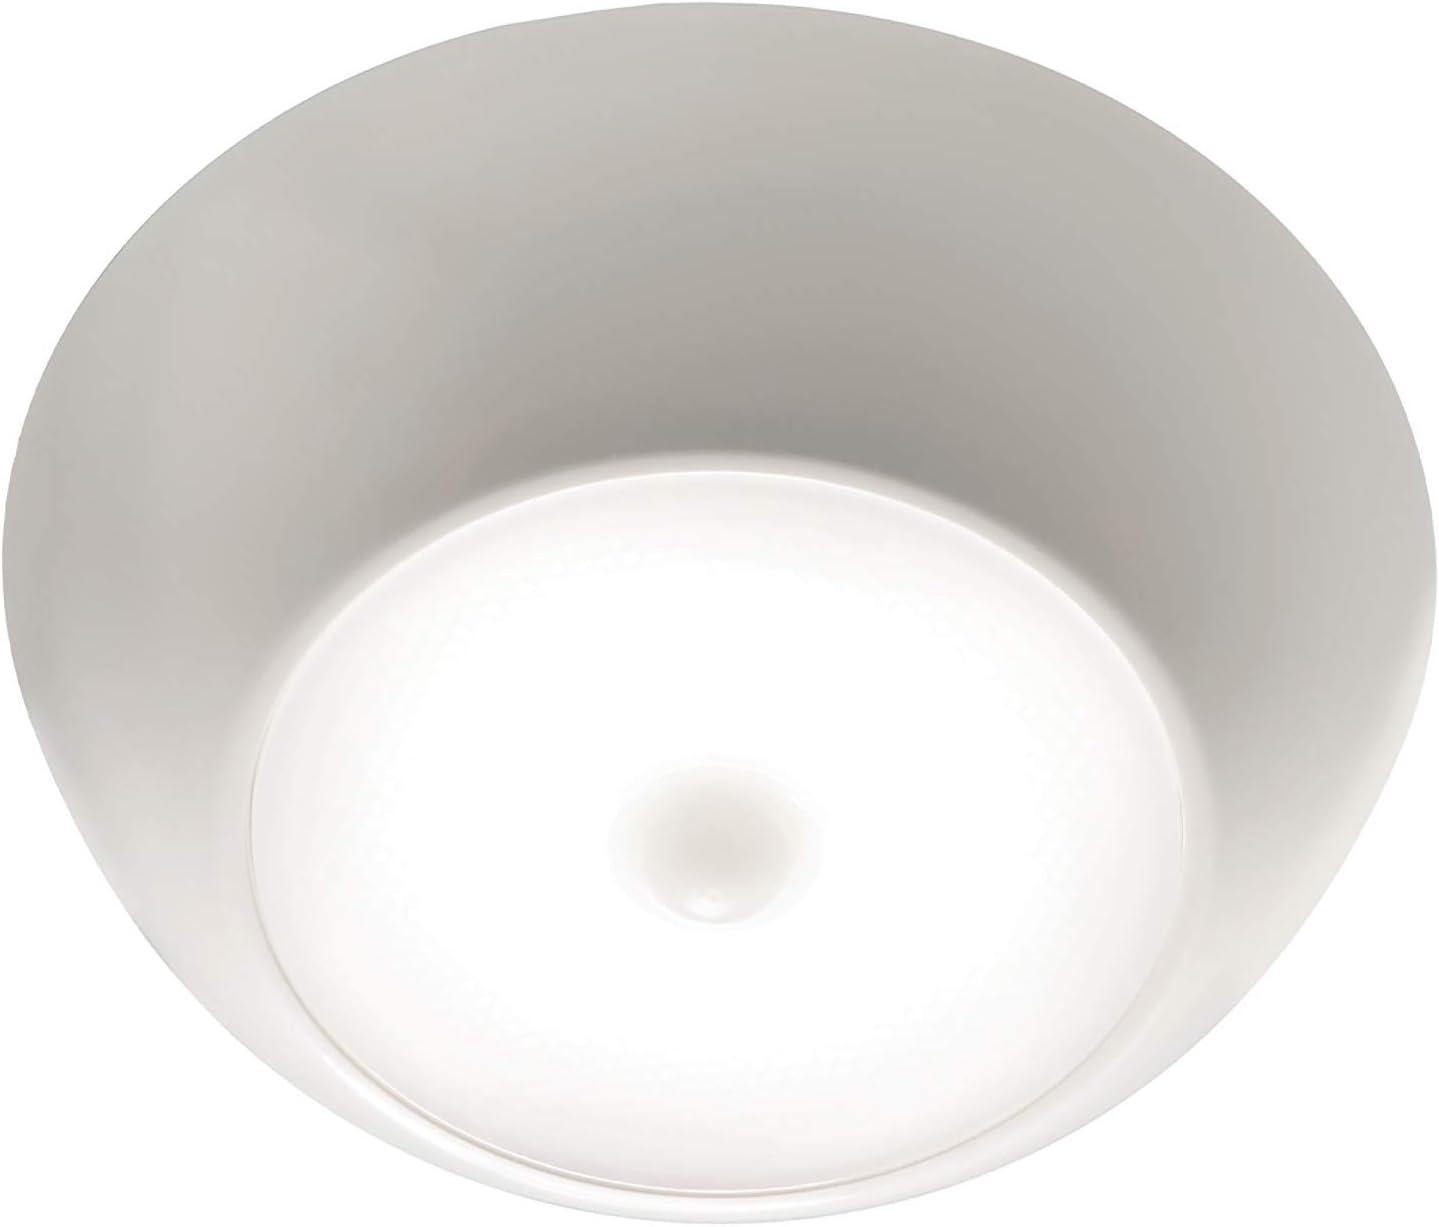 Mr Beams/Wireless Environment Llc MB990-WHT-01-07 Mr Beams Environment Led Ceiling Light, Wireless, Motion Sensing-Quantity 1